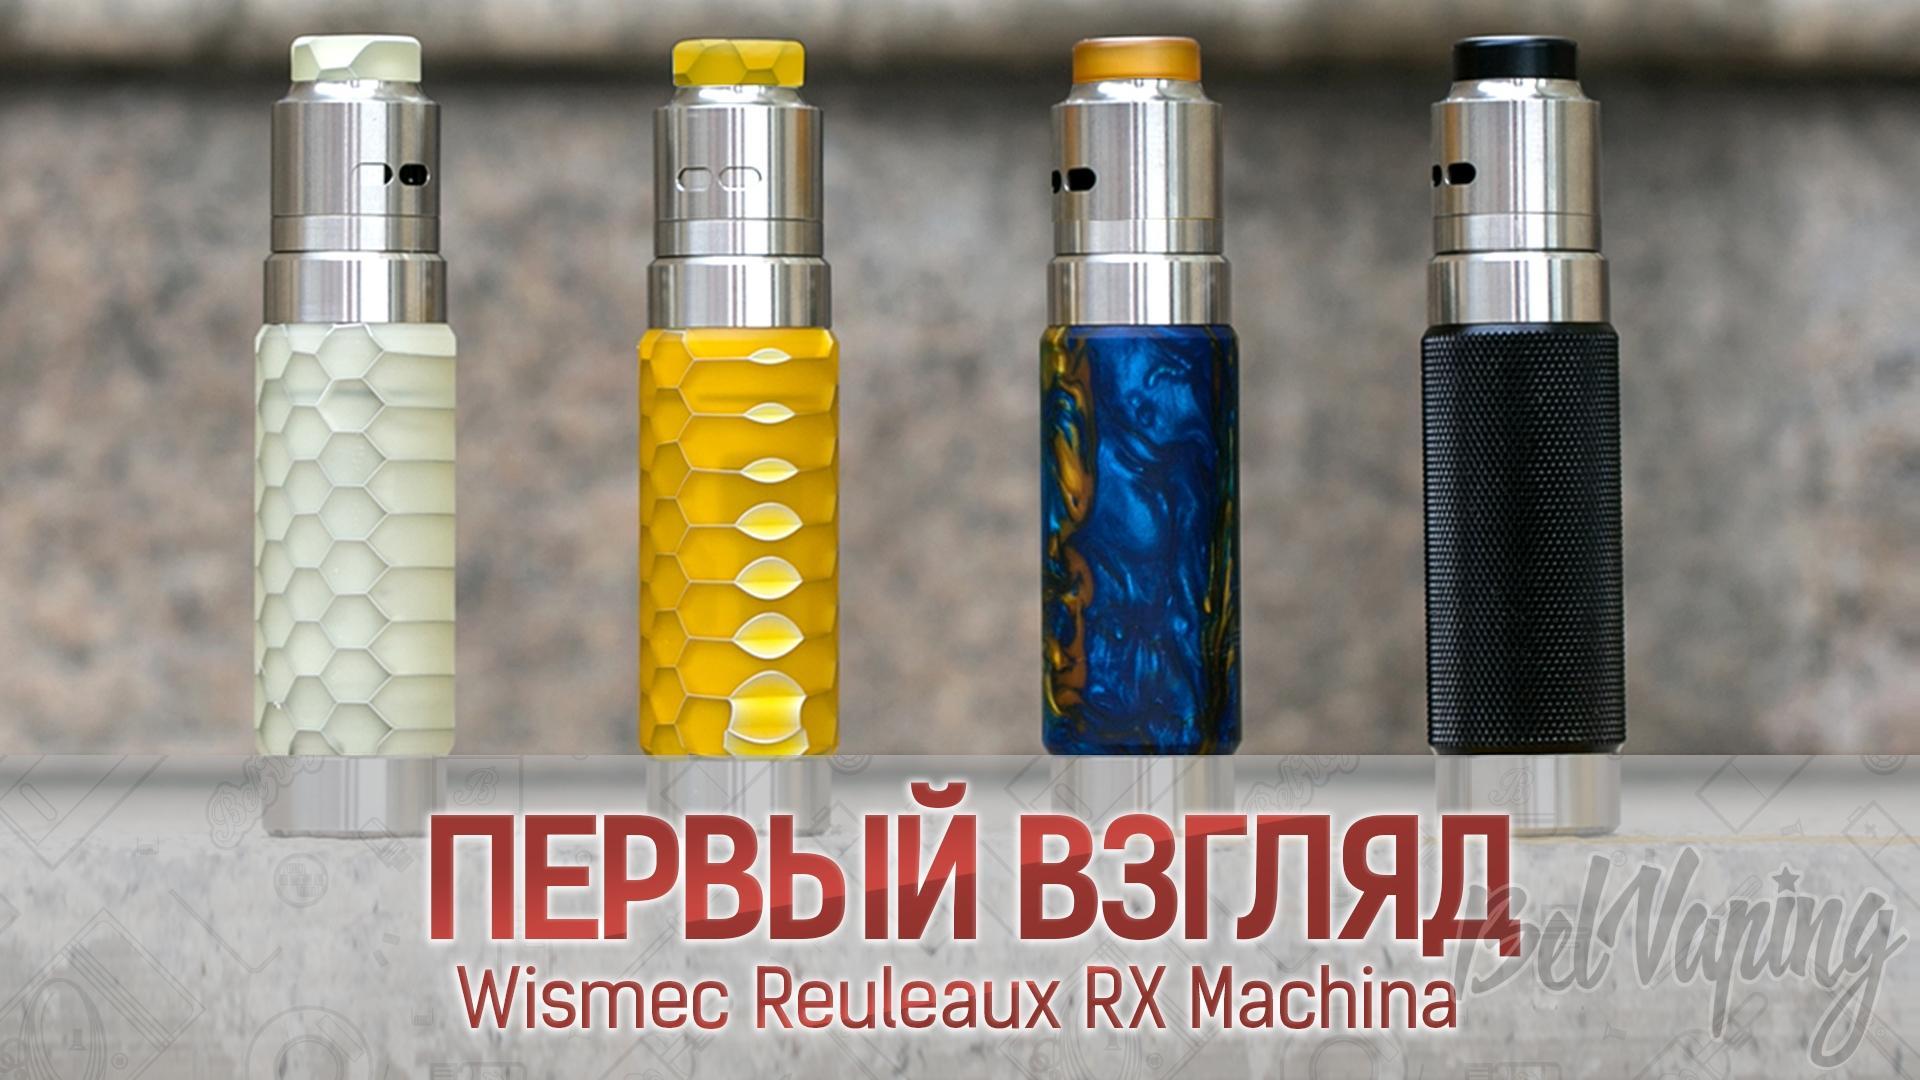 Wismec Reuleaux RX Machina. Первый взгляд